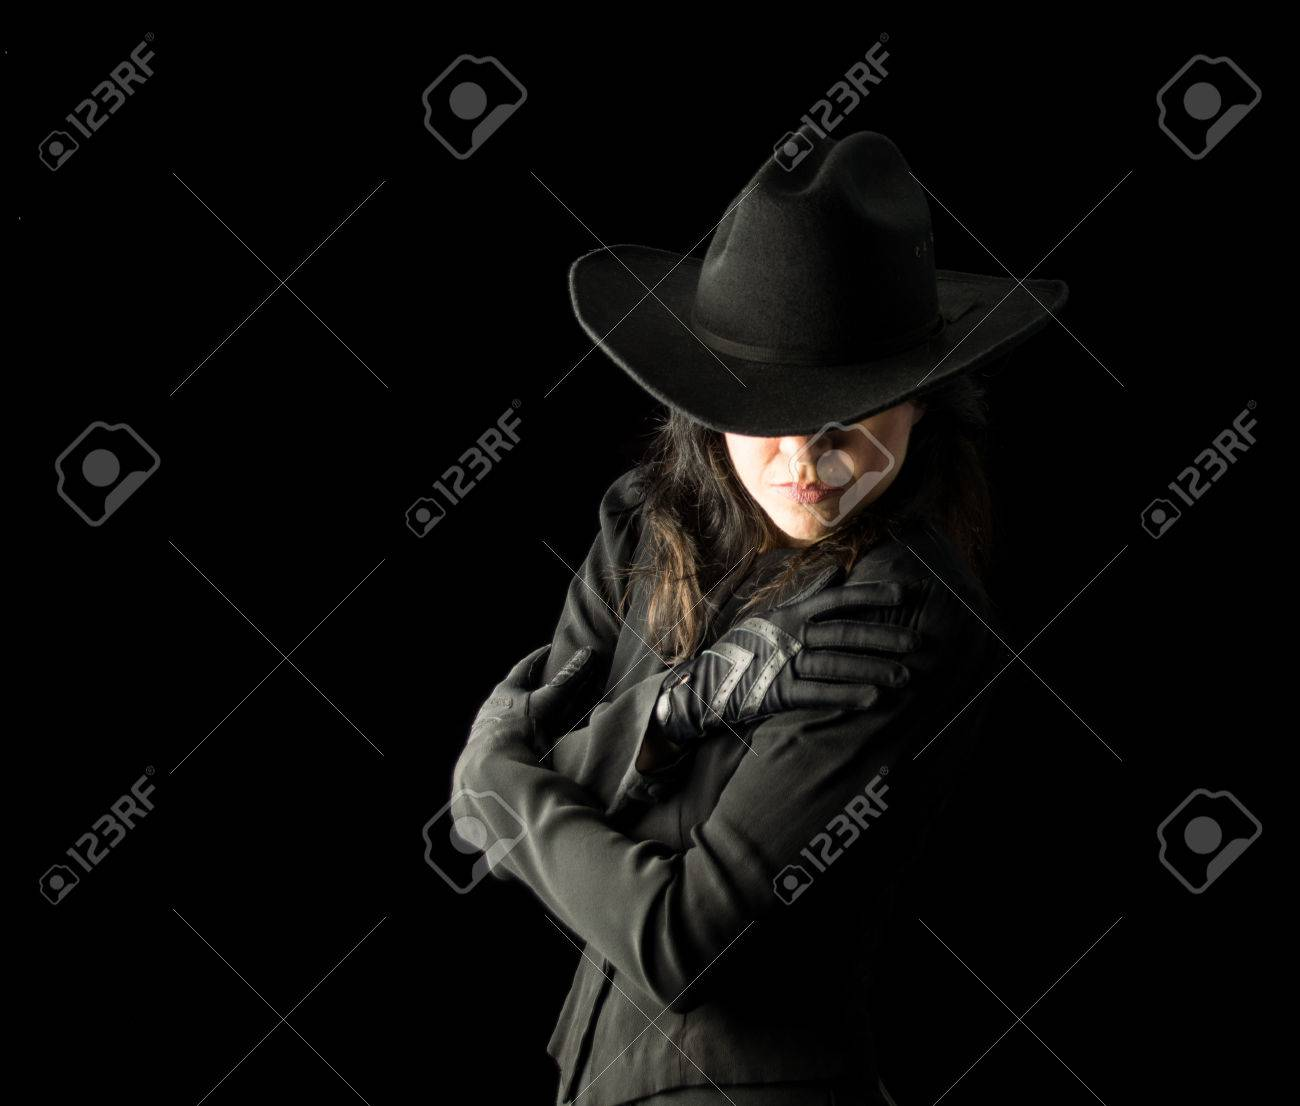 09547dc73 Brunette woman in black dress and black gloves, wearing a black..